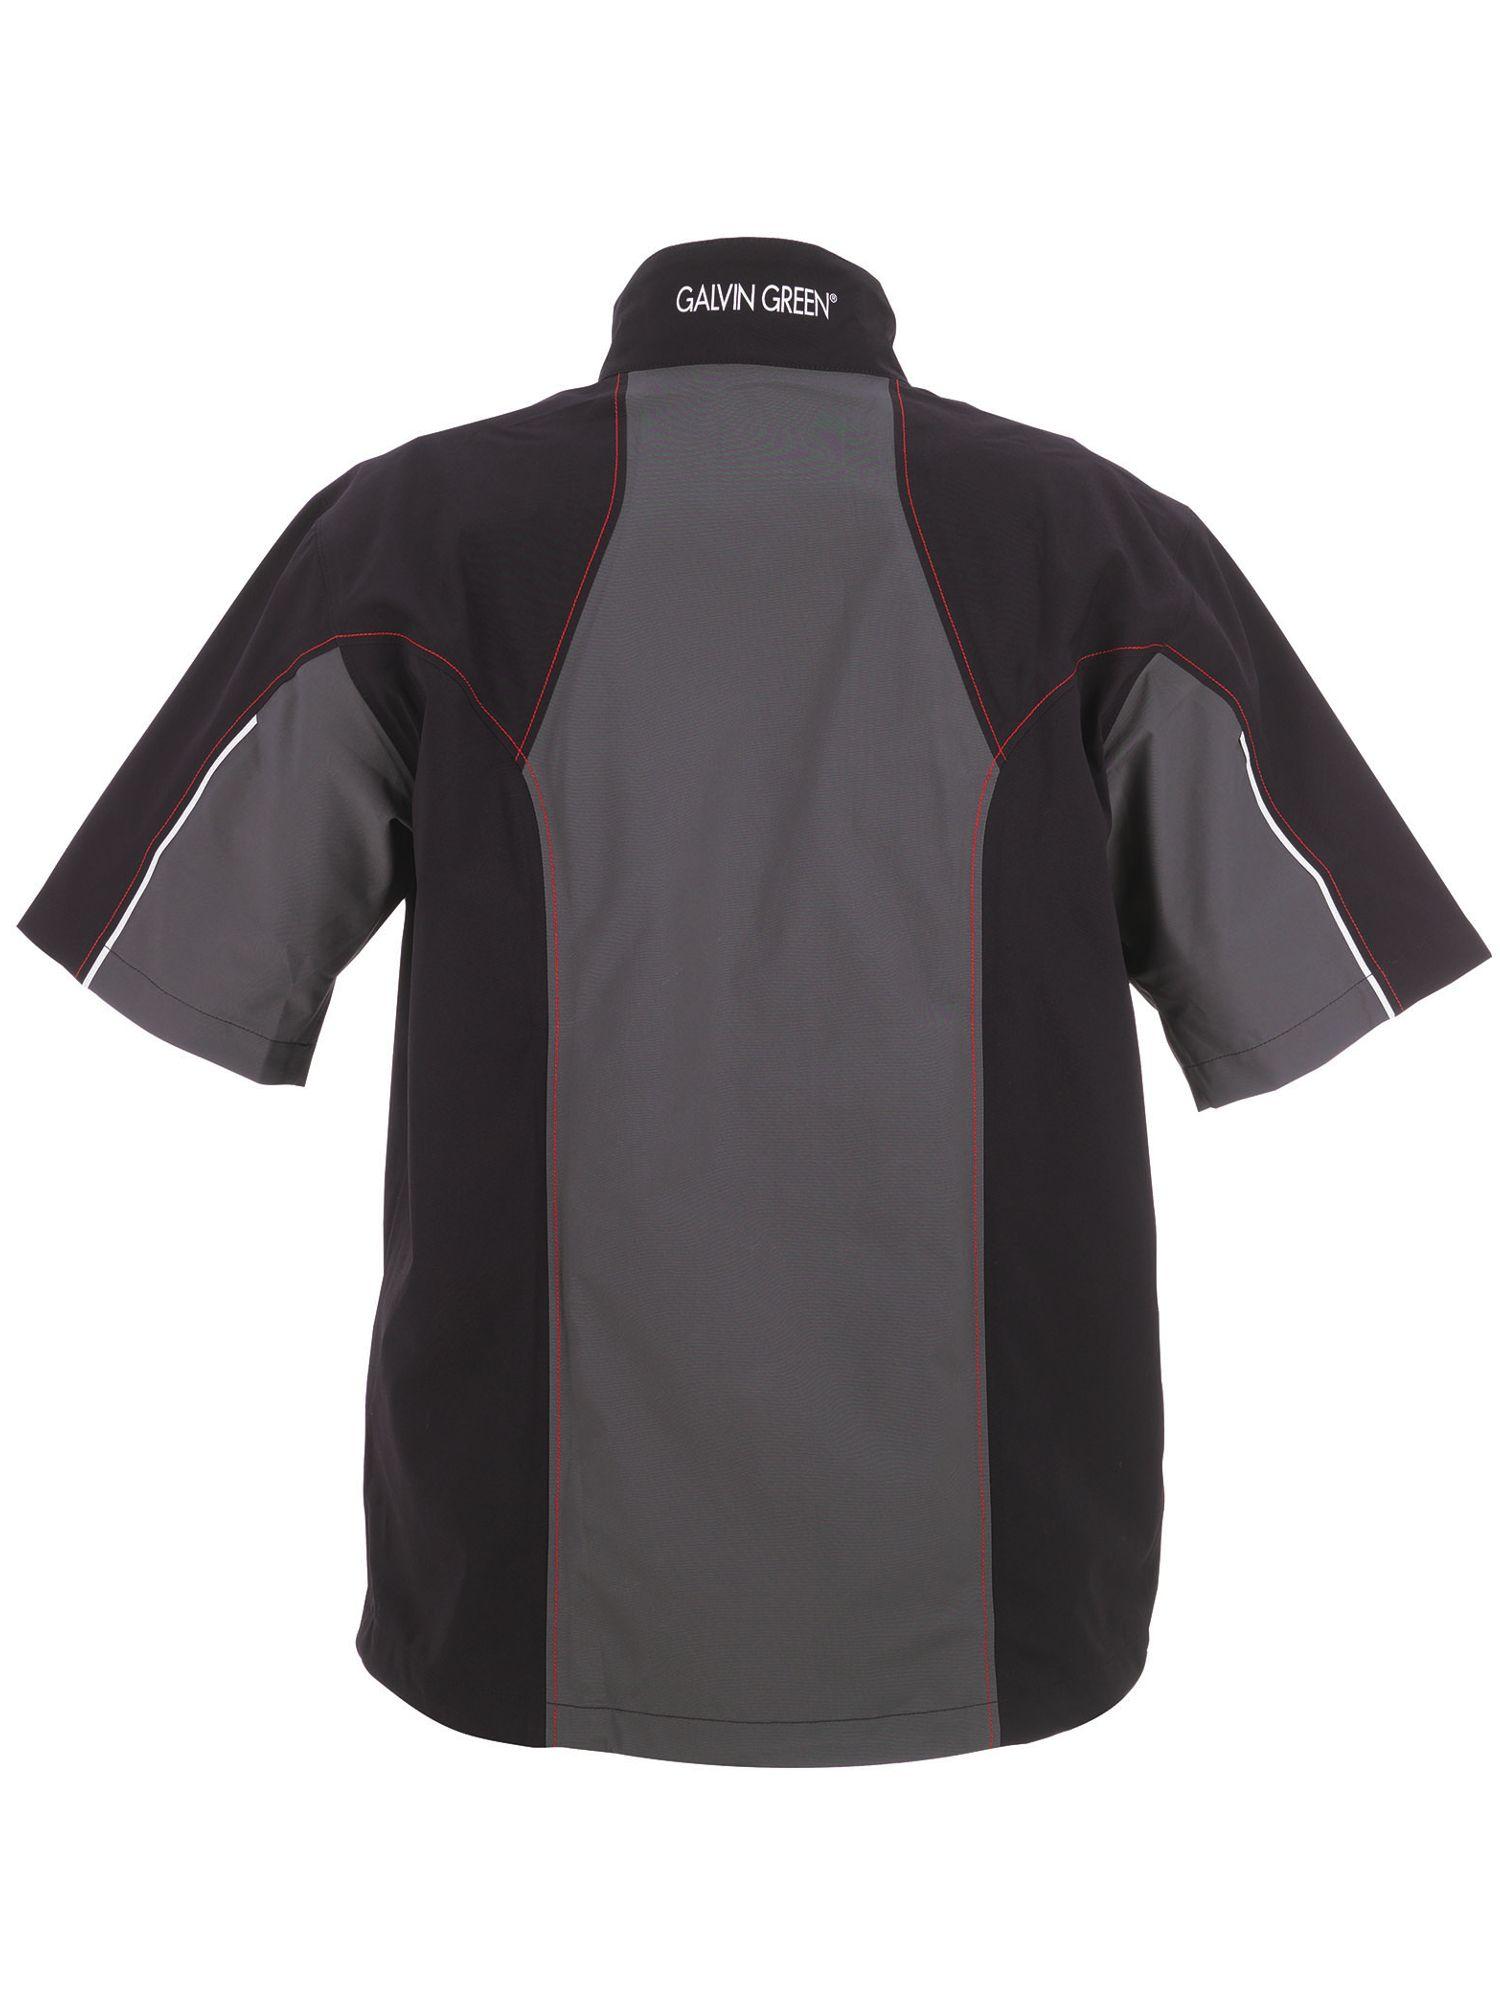 Galvin green Air Gore Tex Waterproof Jacket in Black for Men | Lyst